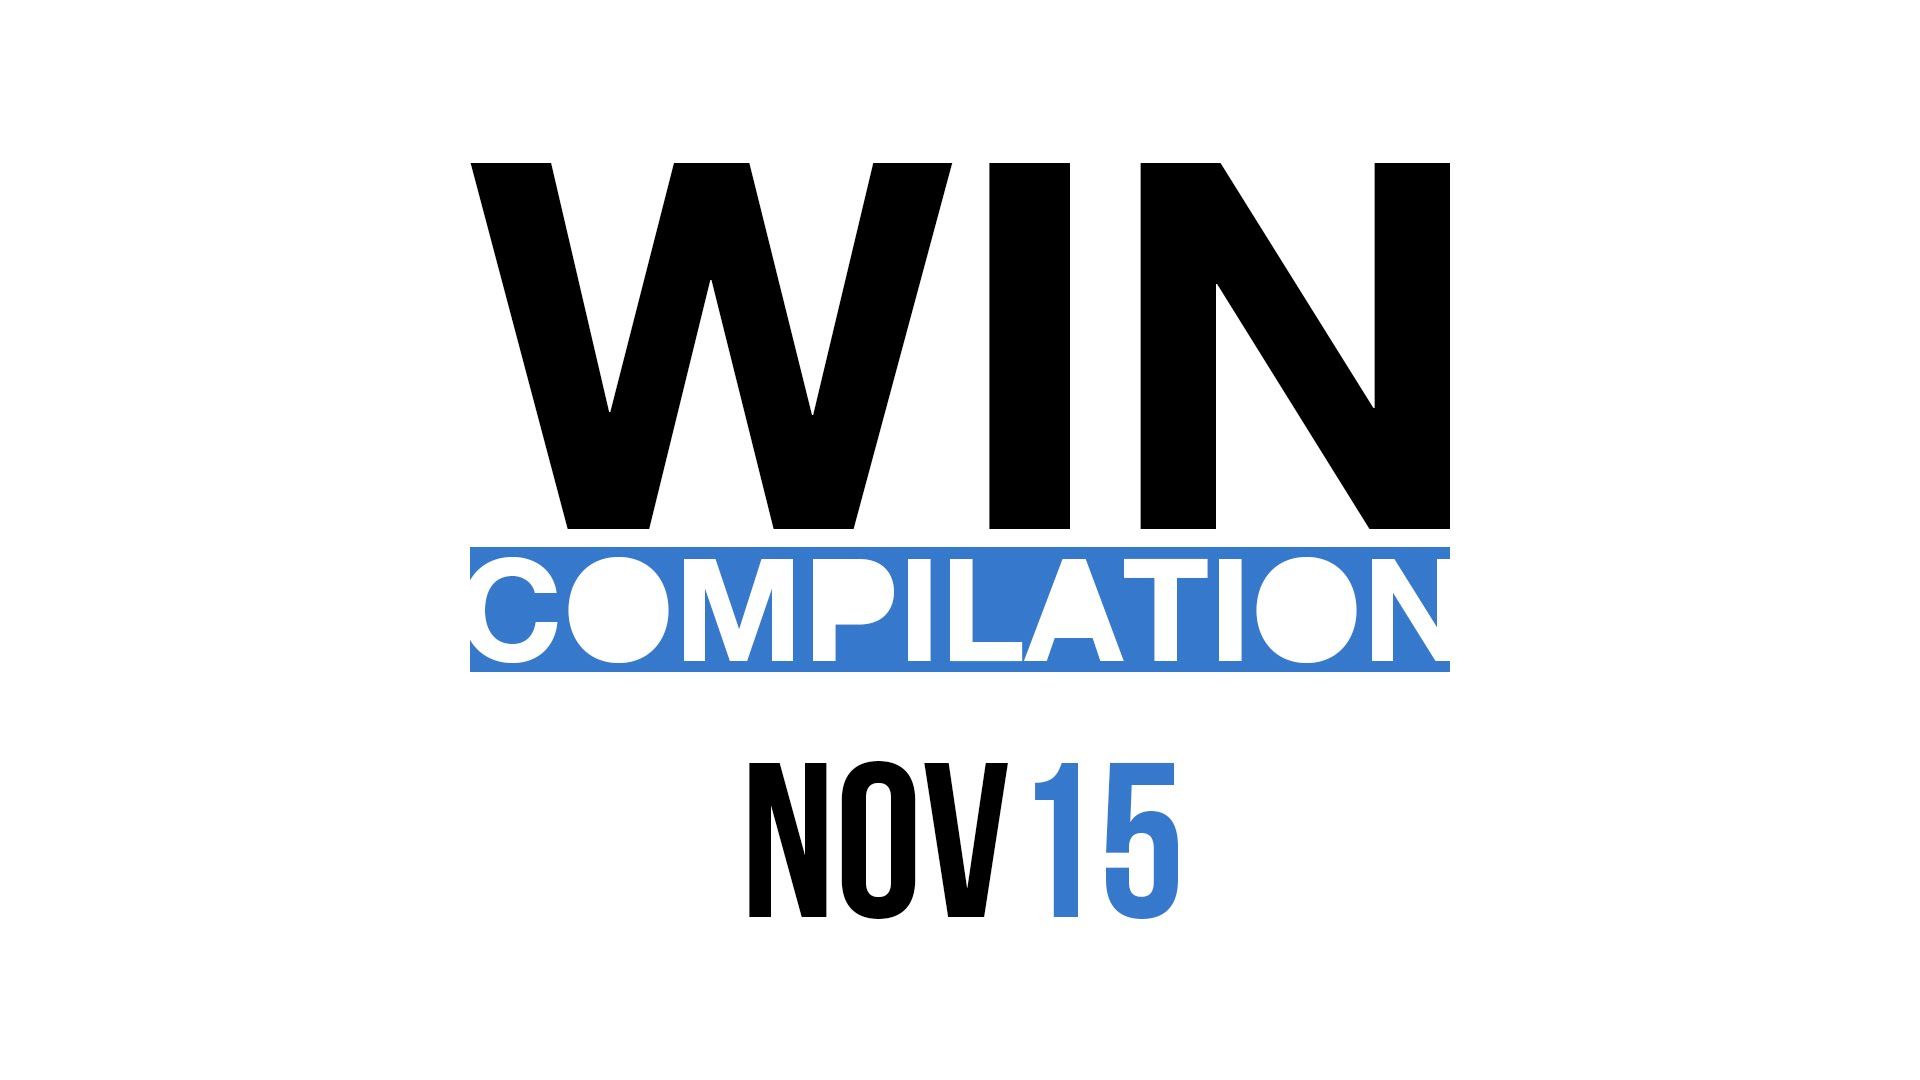 Win-Compilation November 2015